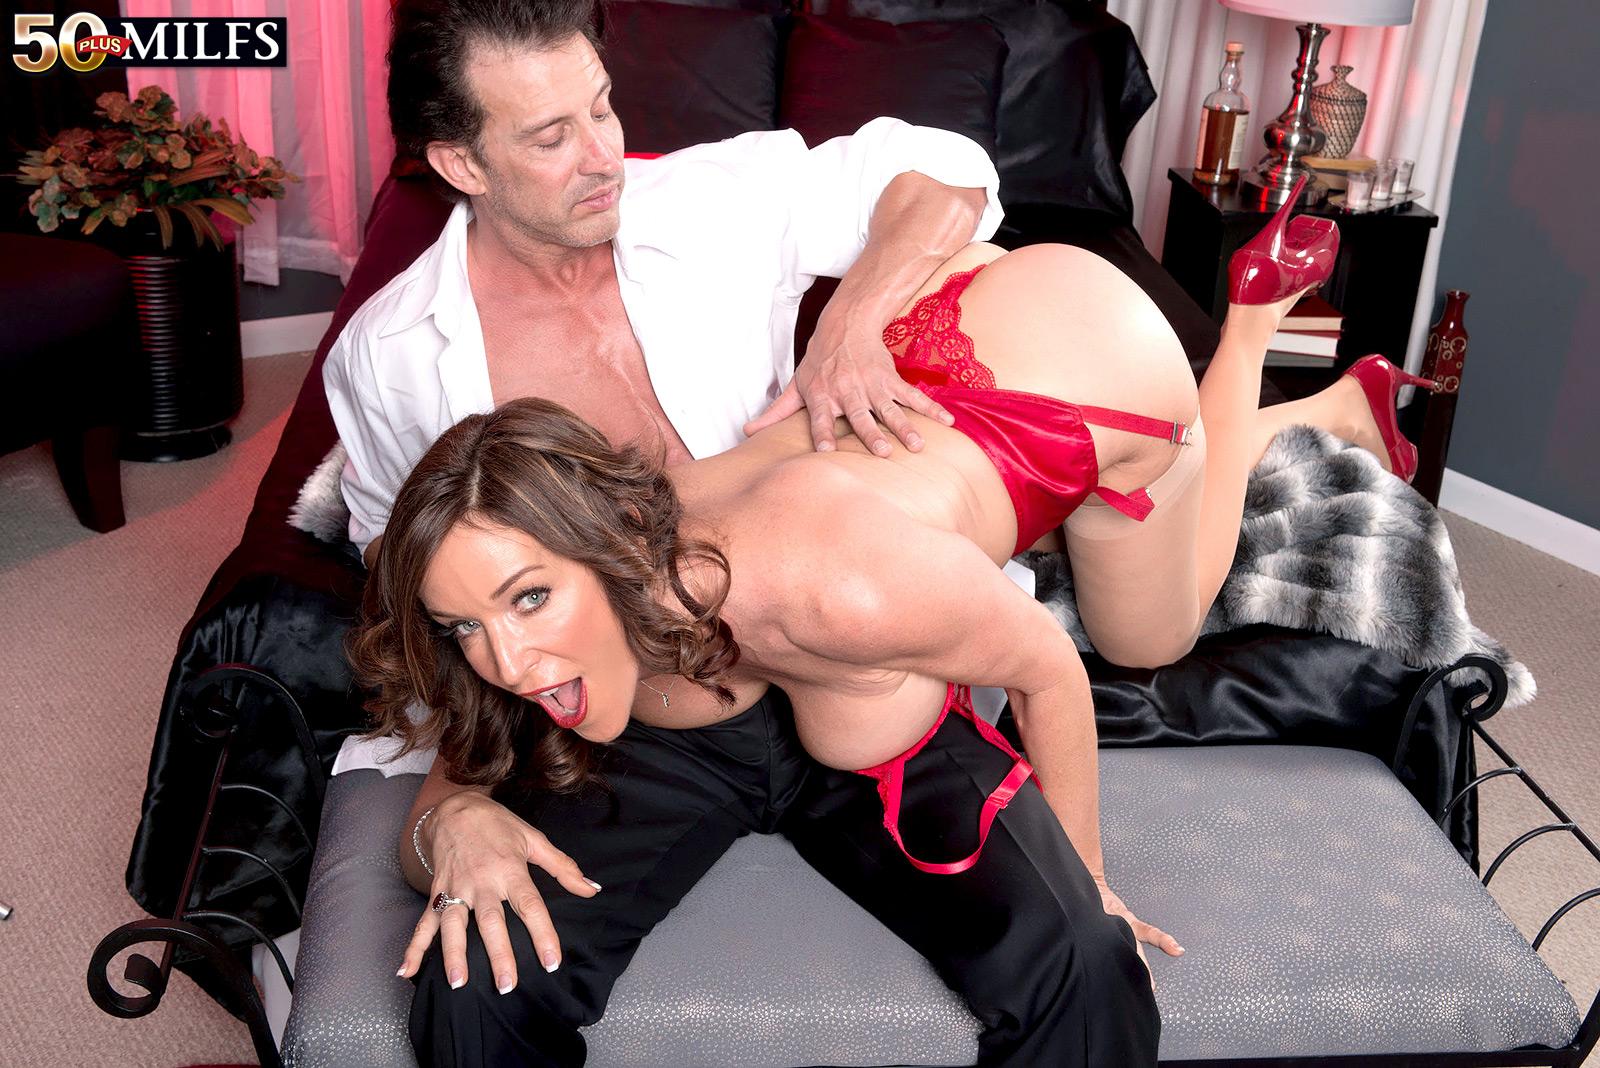 free-rachel-steele-porn-ladyboy-porn-movie